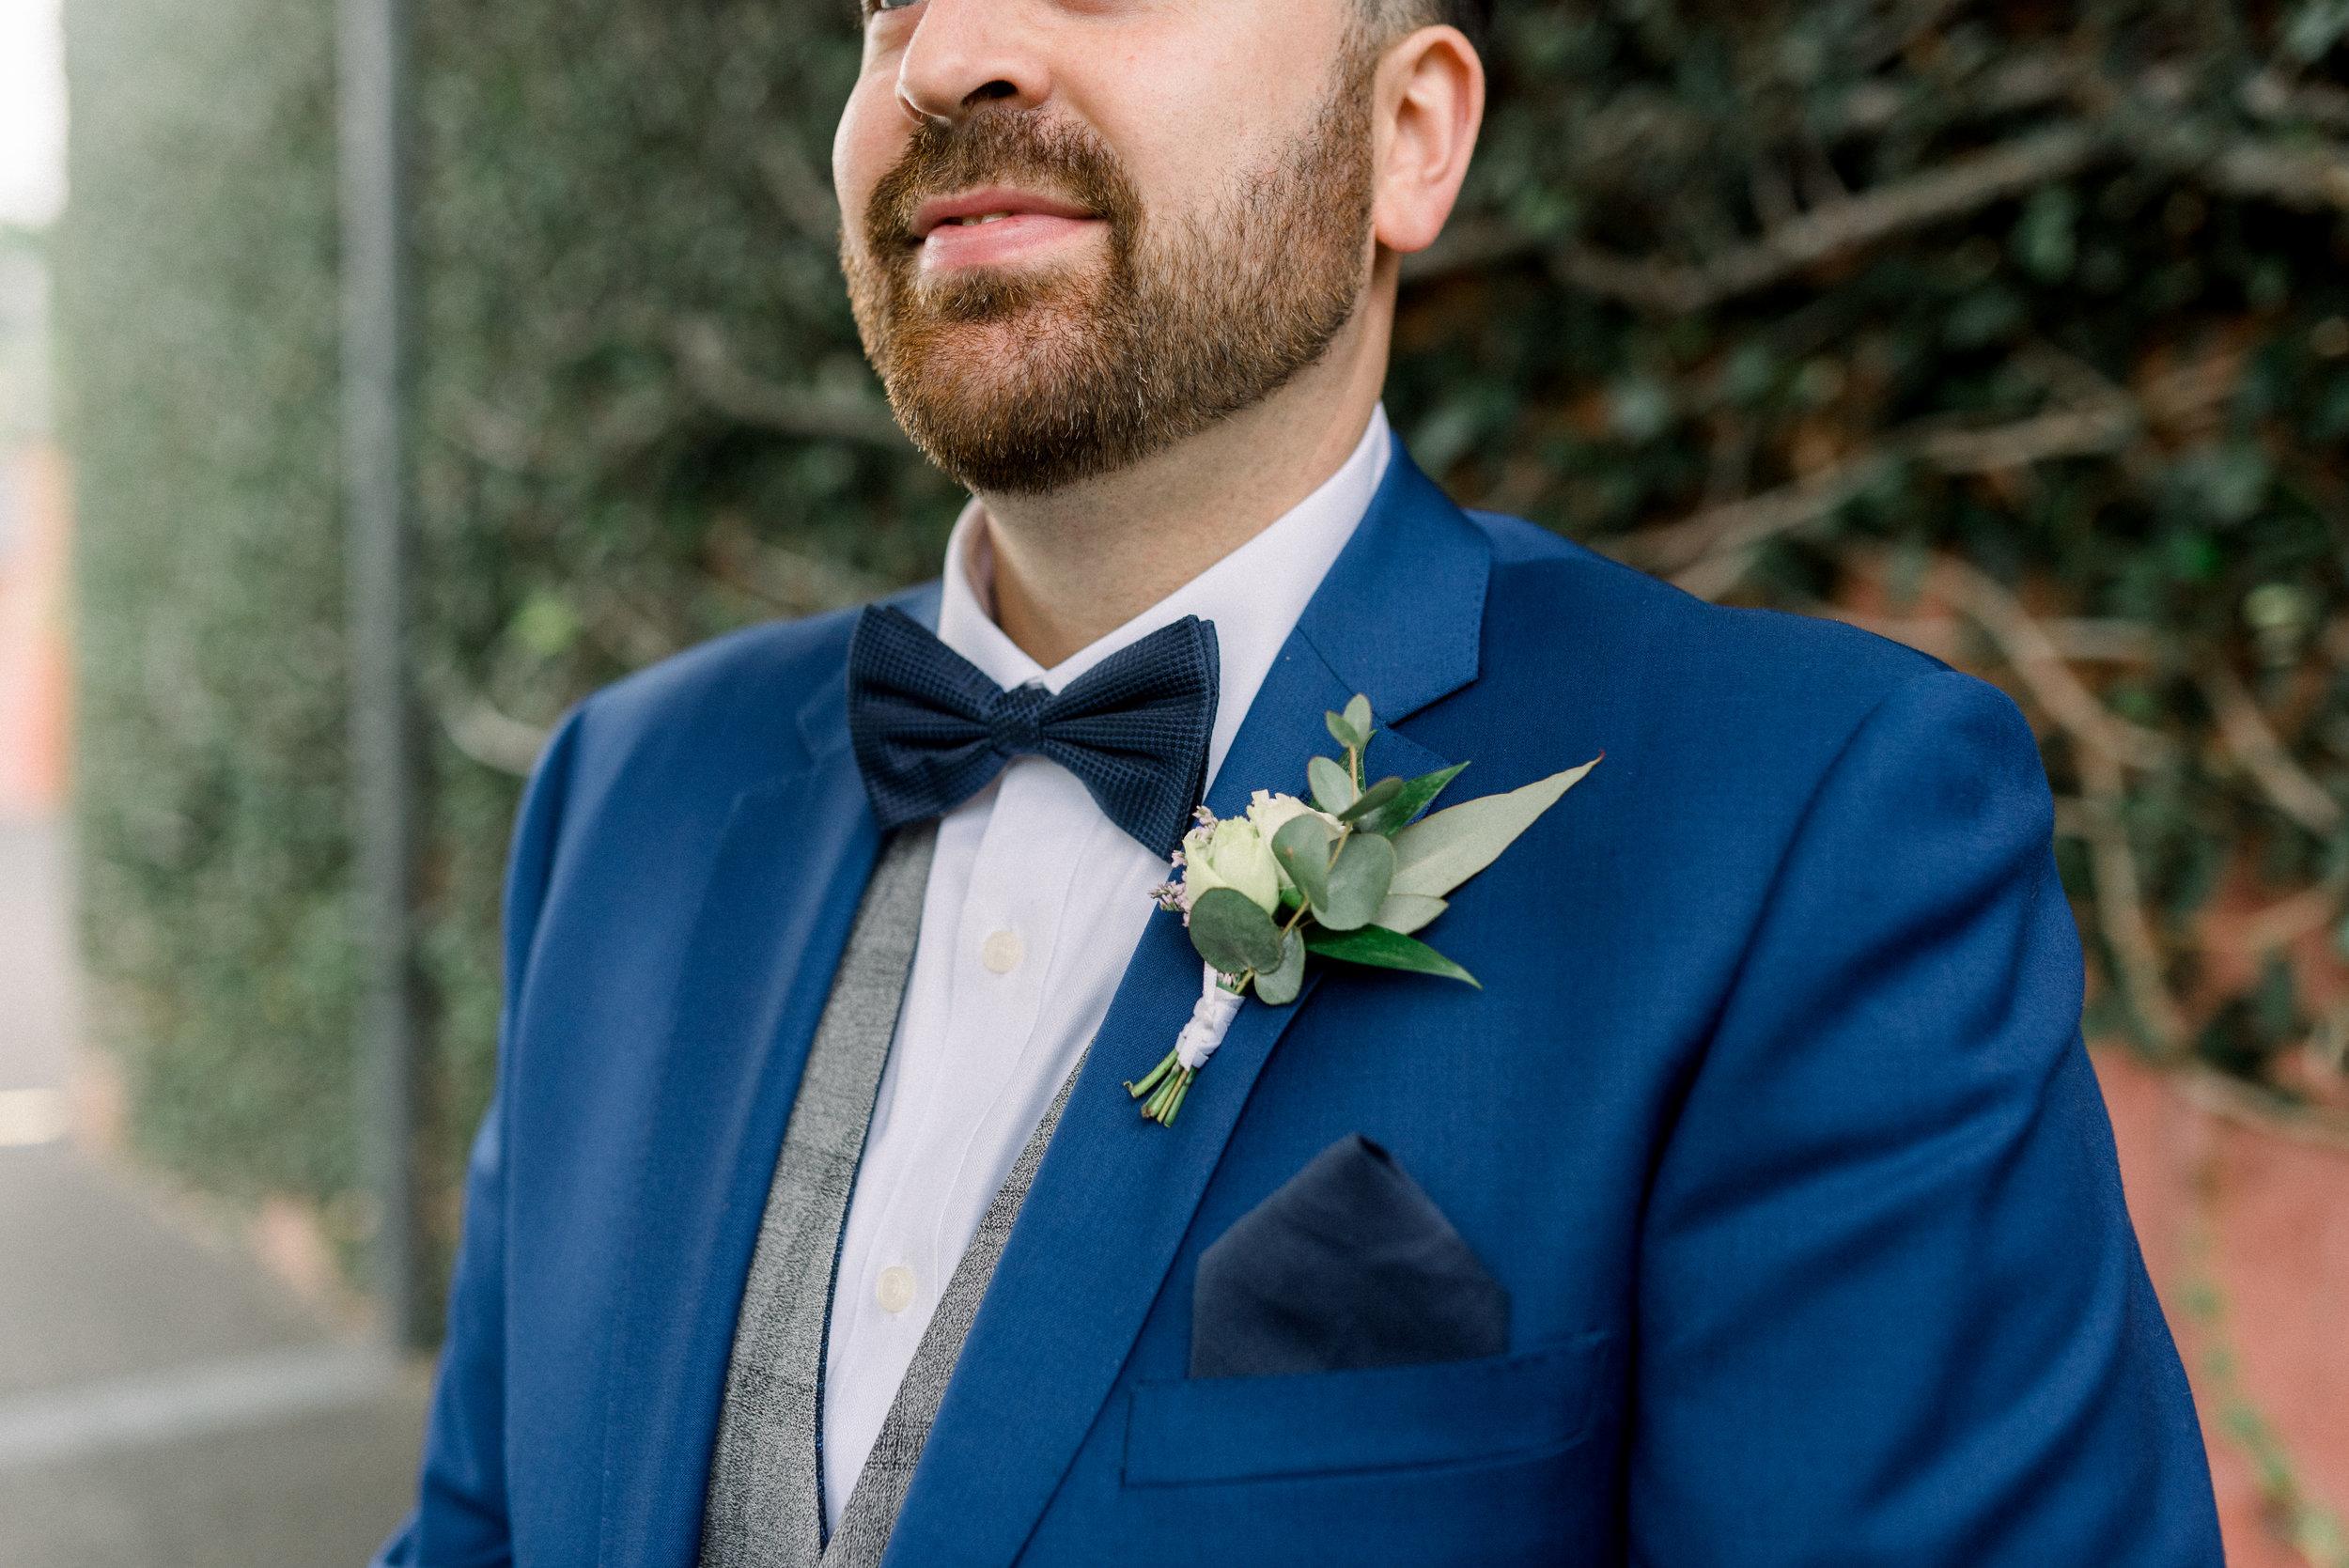 brisbane-city-wedding-photographer-romantic-wedding-66.jpg